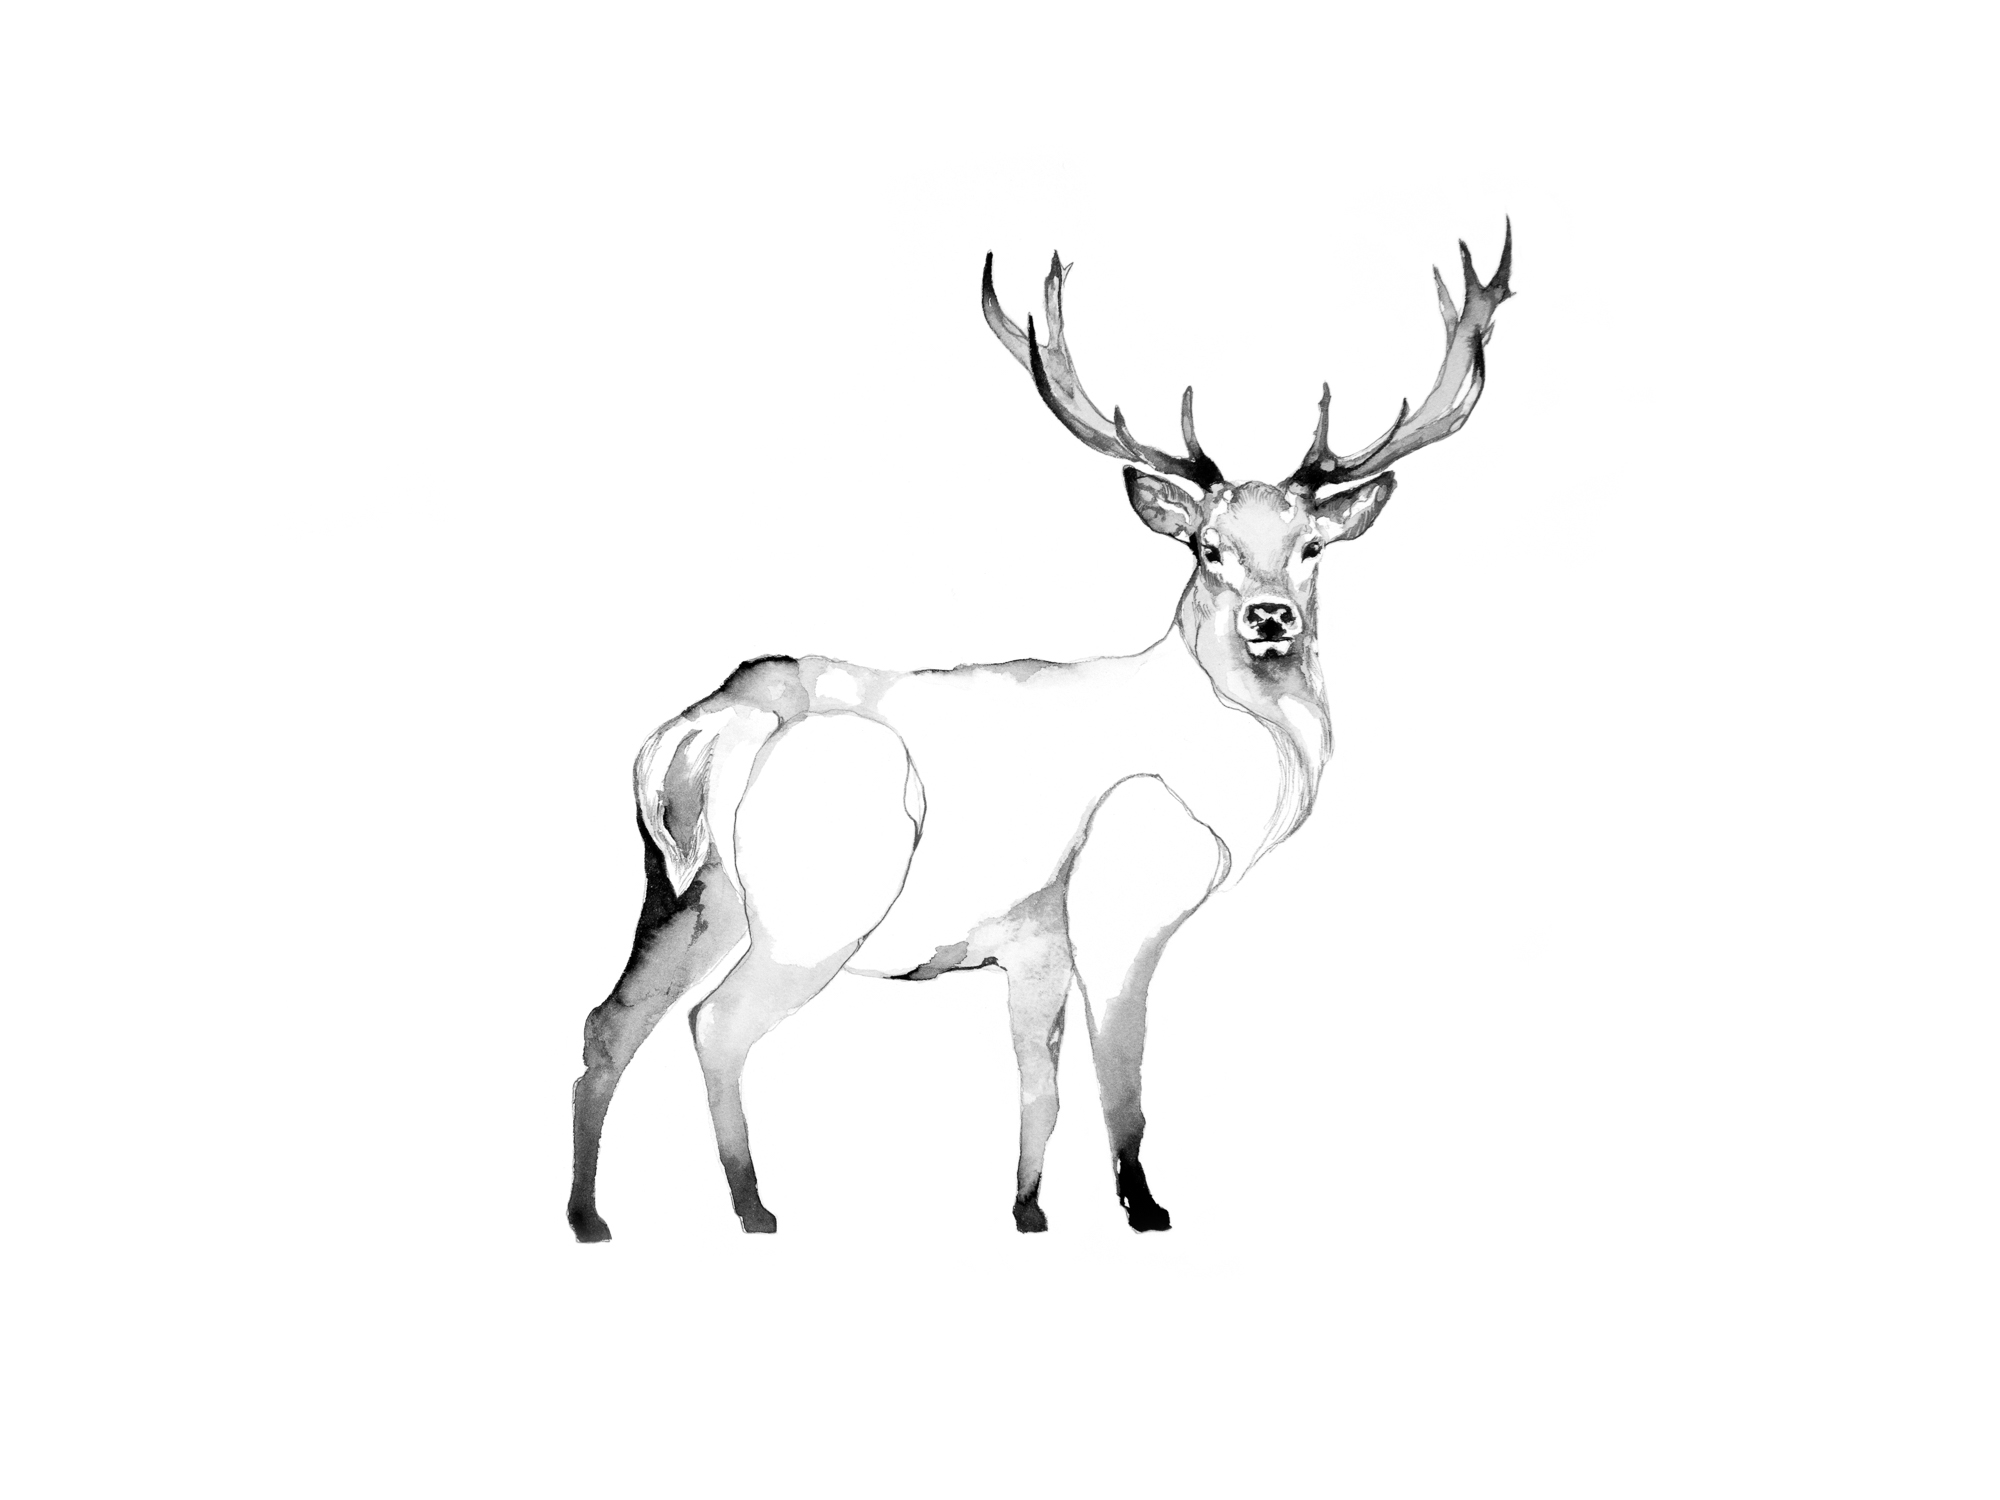 2-Bec_Kilpatrick_Illustration_Antlers_WingsELK